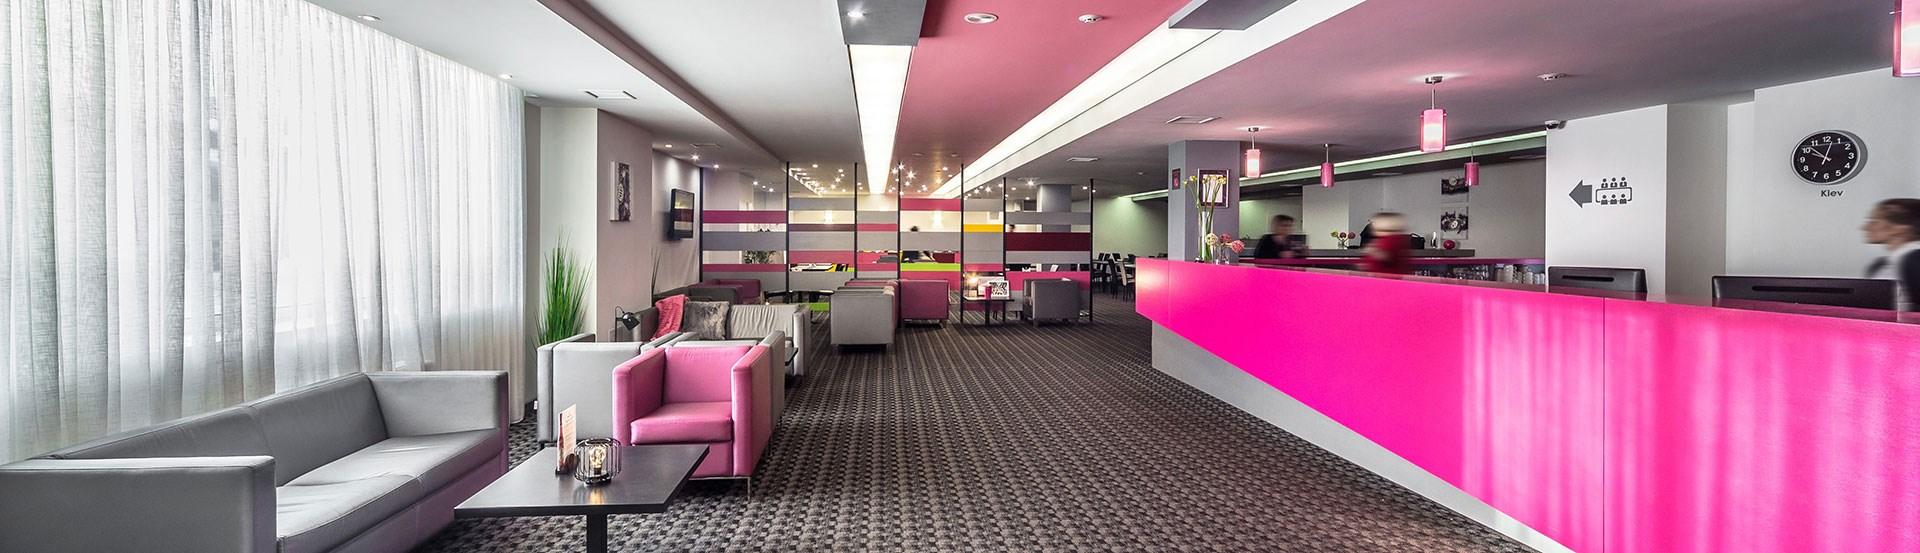 Amarant Hotel Kiev - Reception